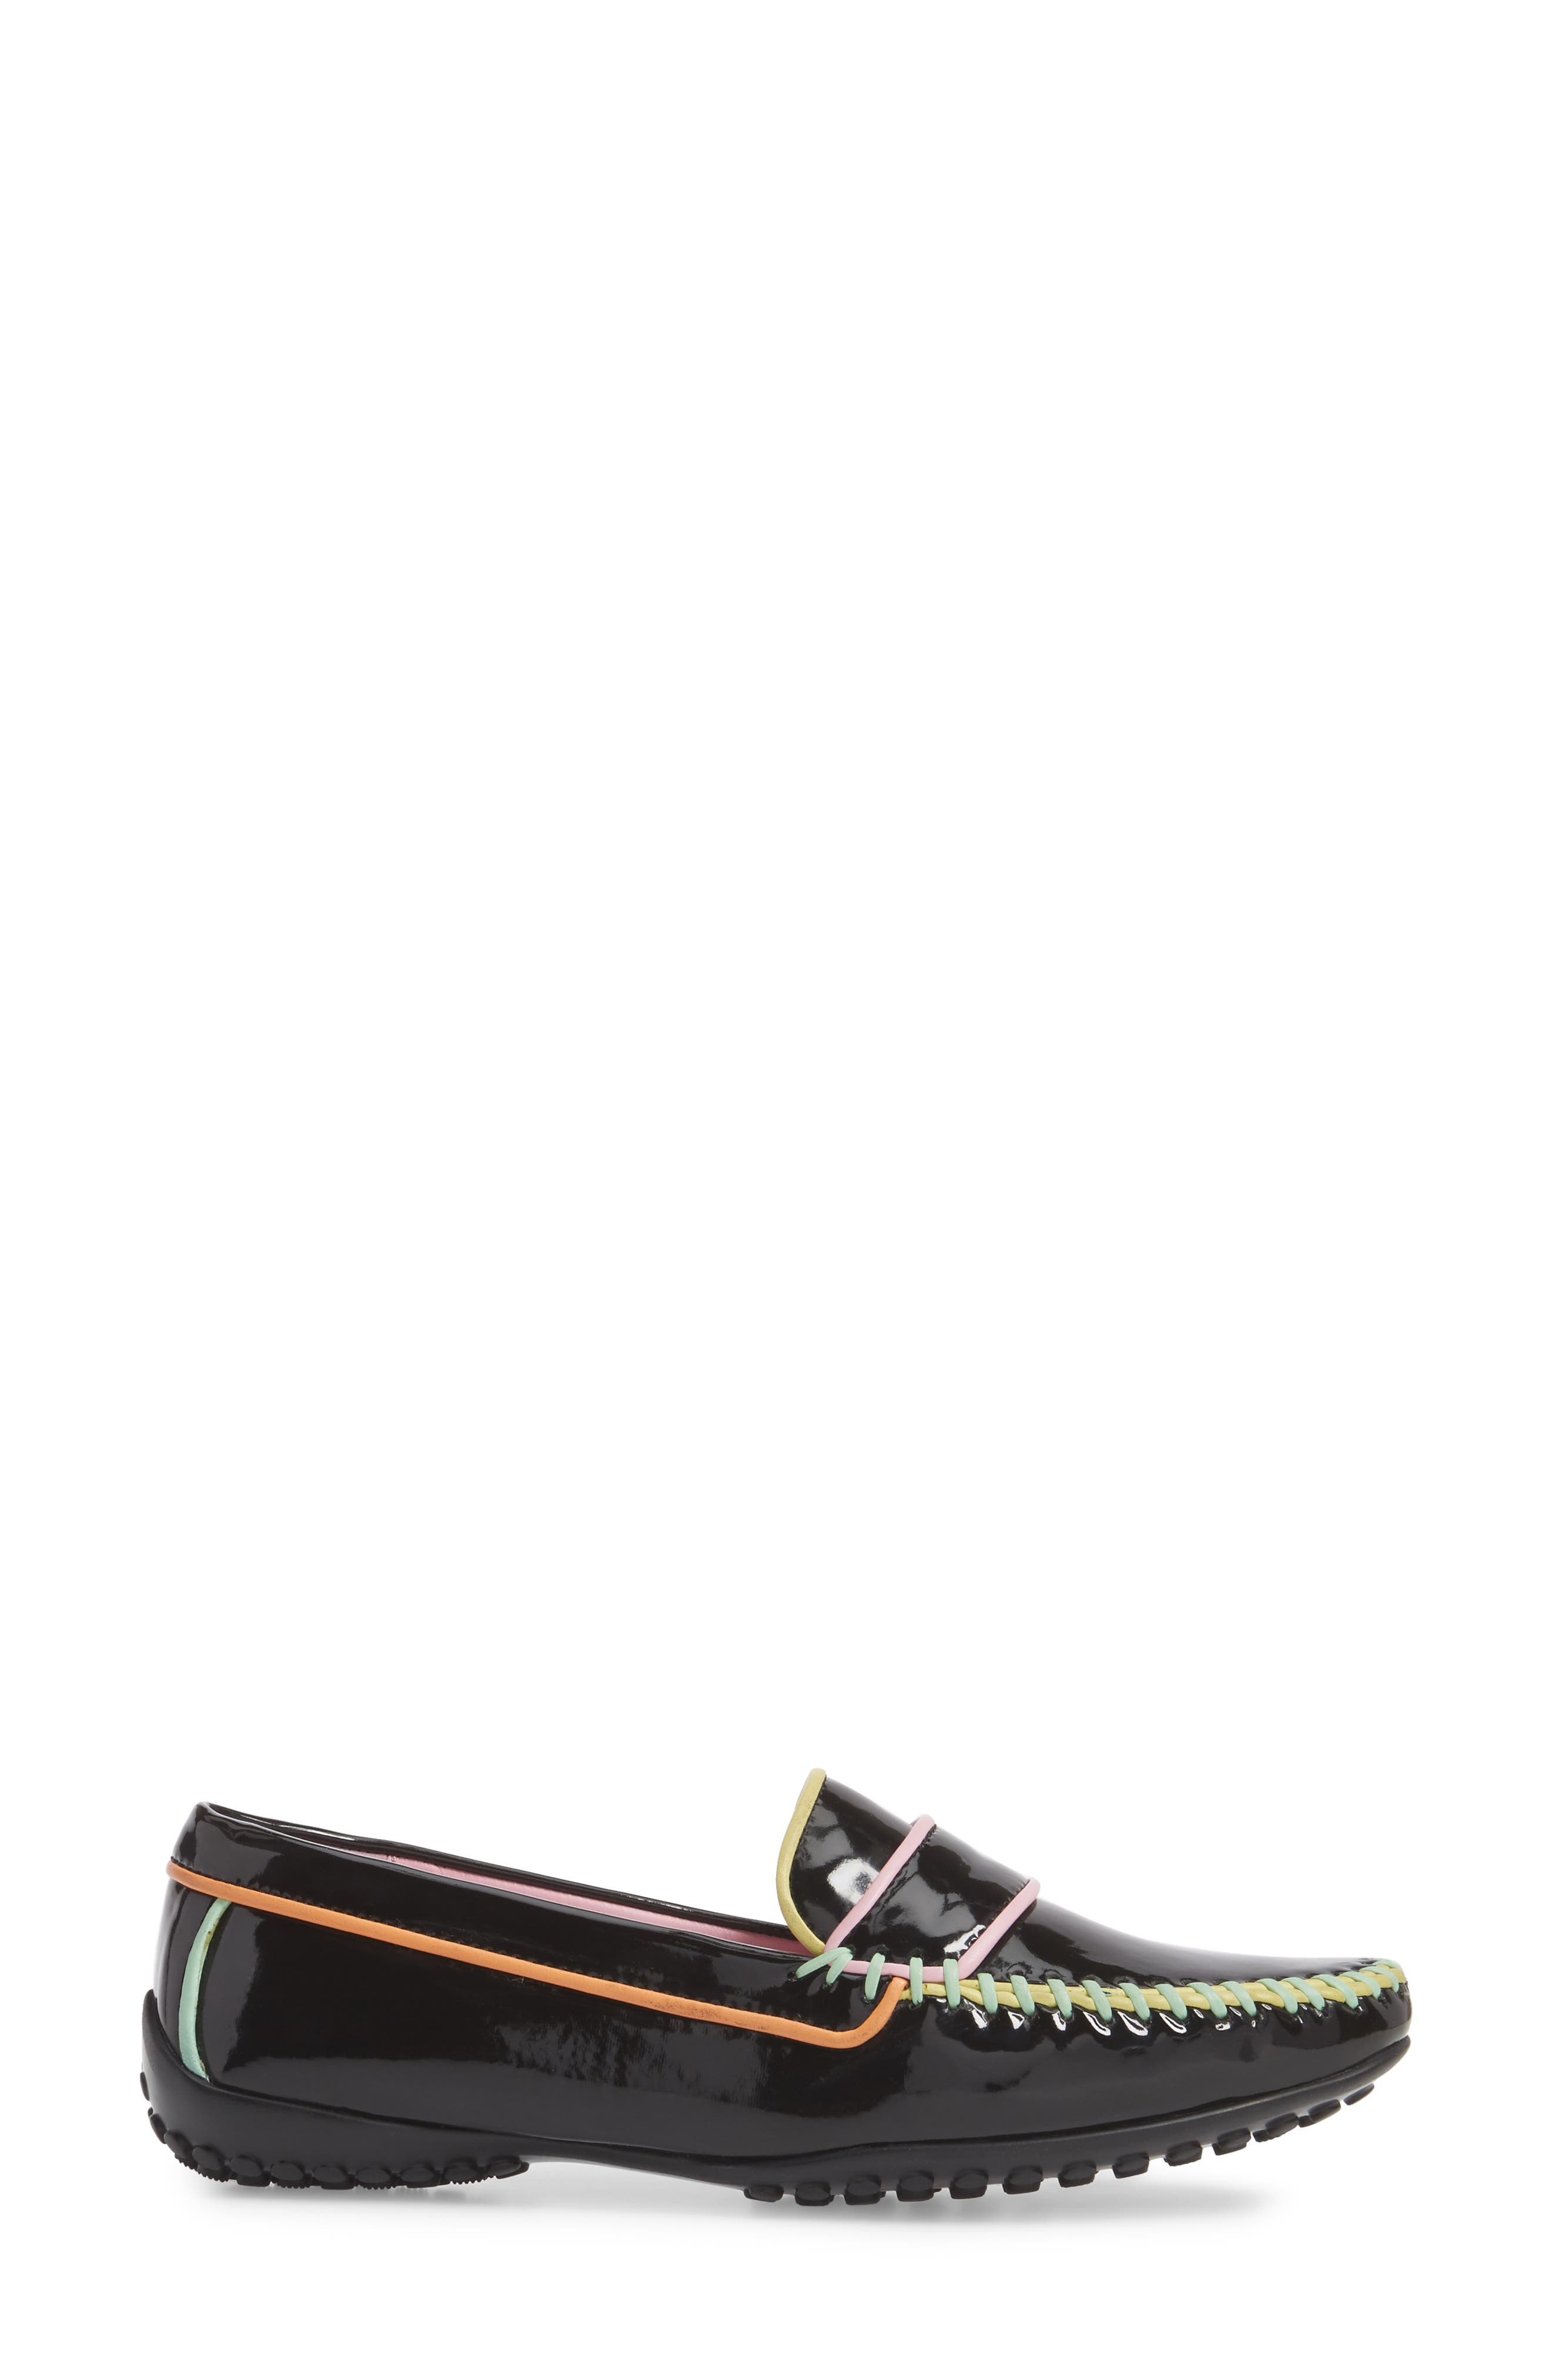 Moccasin Loafer,                             Alternate thumbnail 3, color,                             Black/ Black Patent